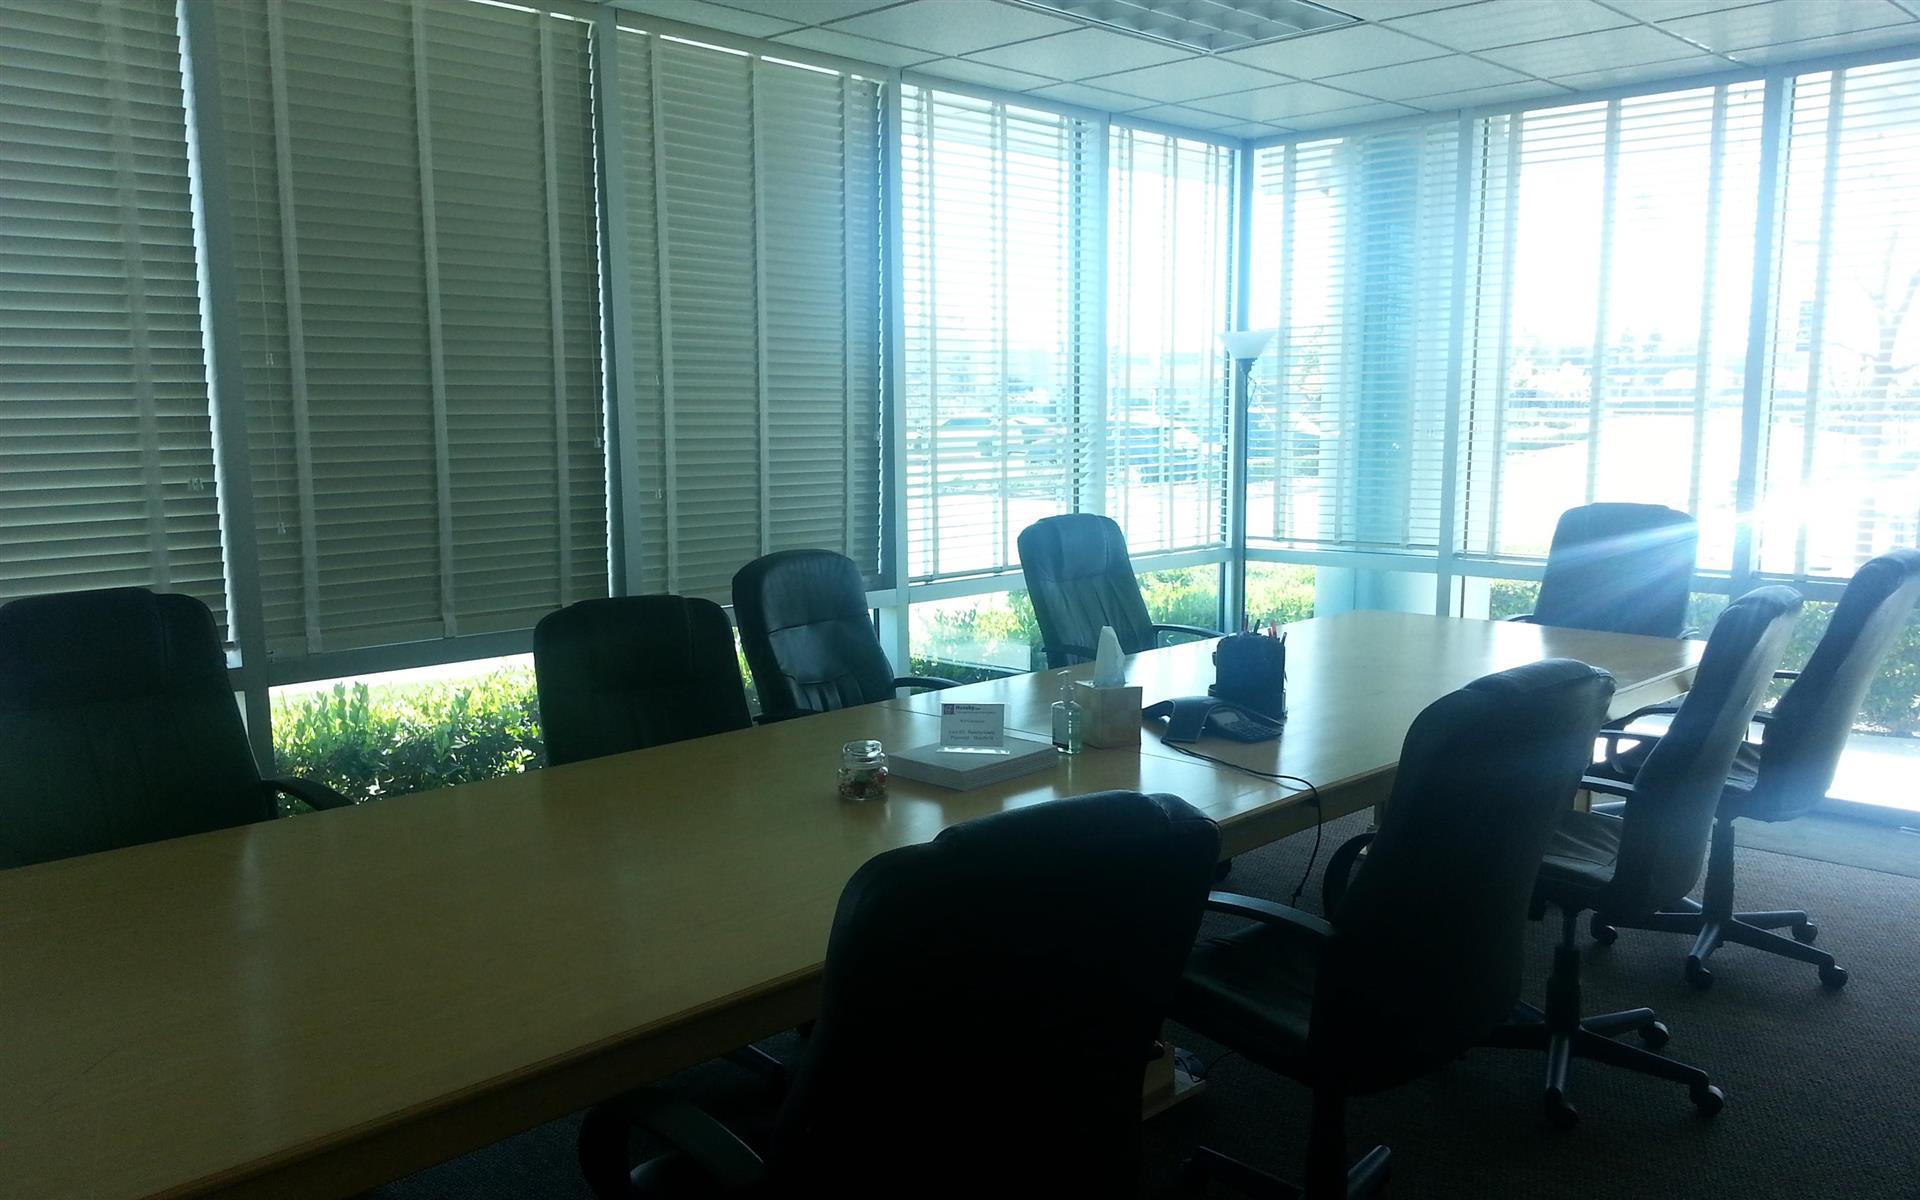 Huseby Fresno - Board Room Conference Room 5